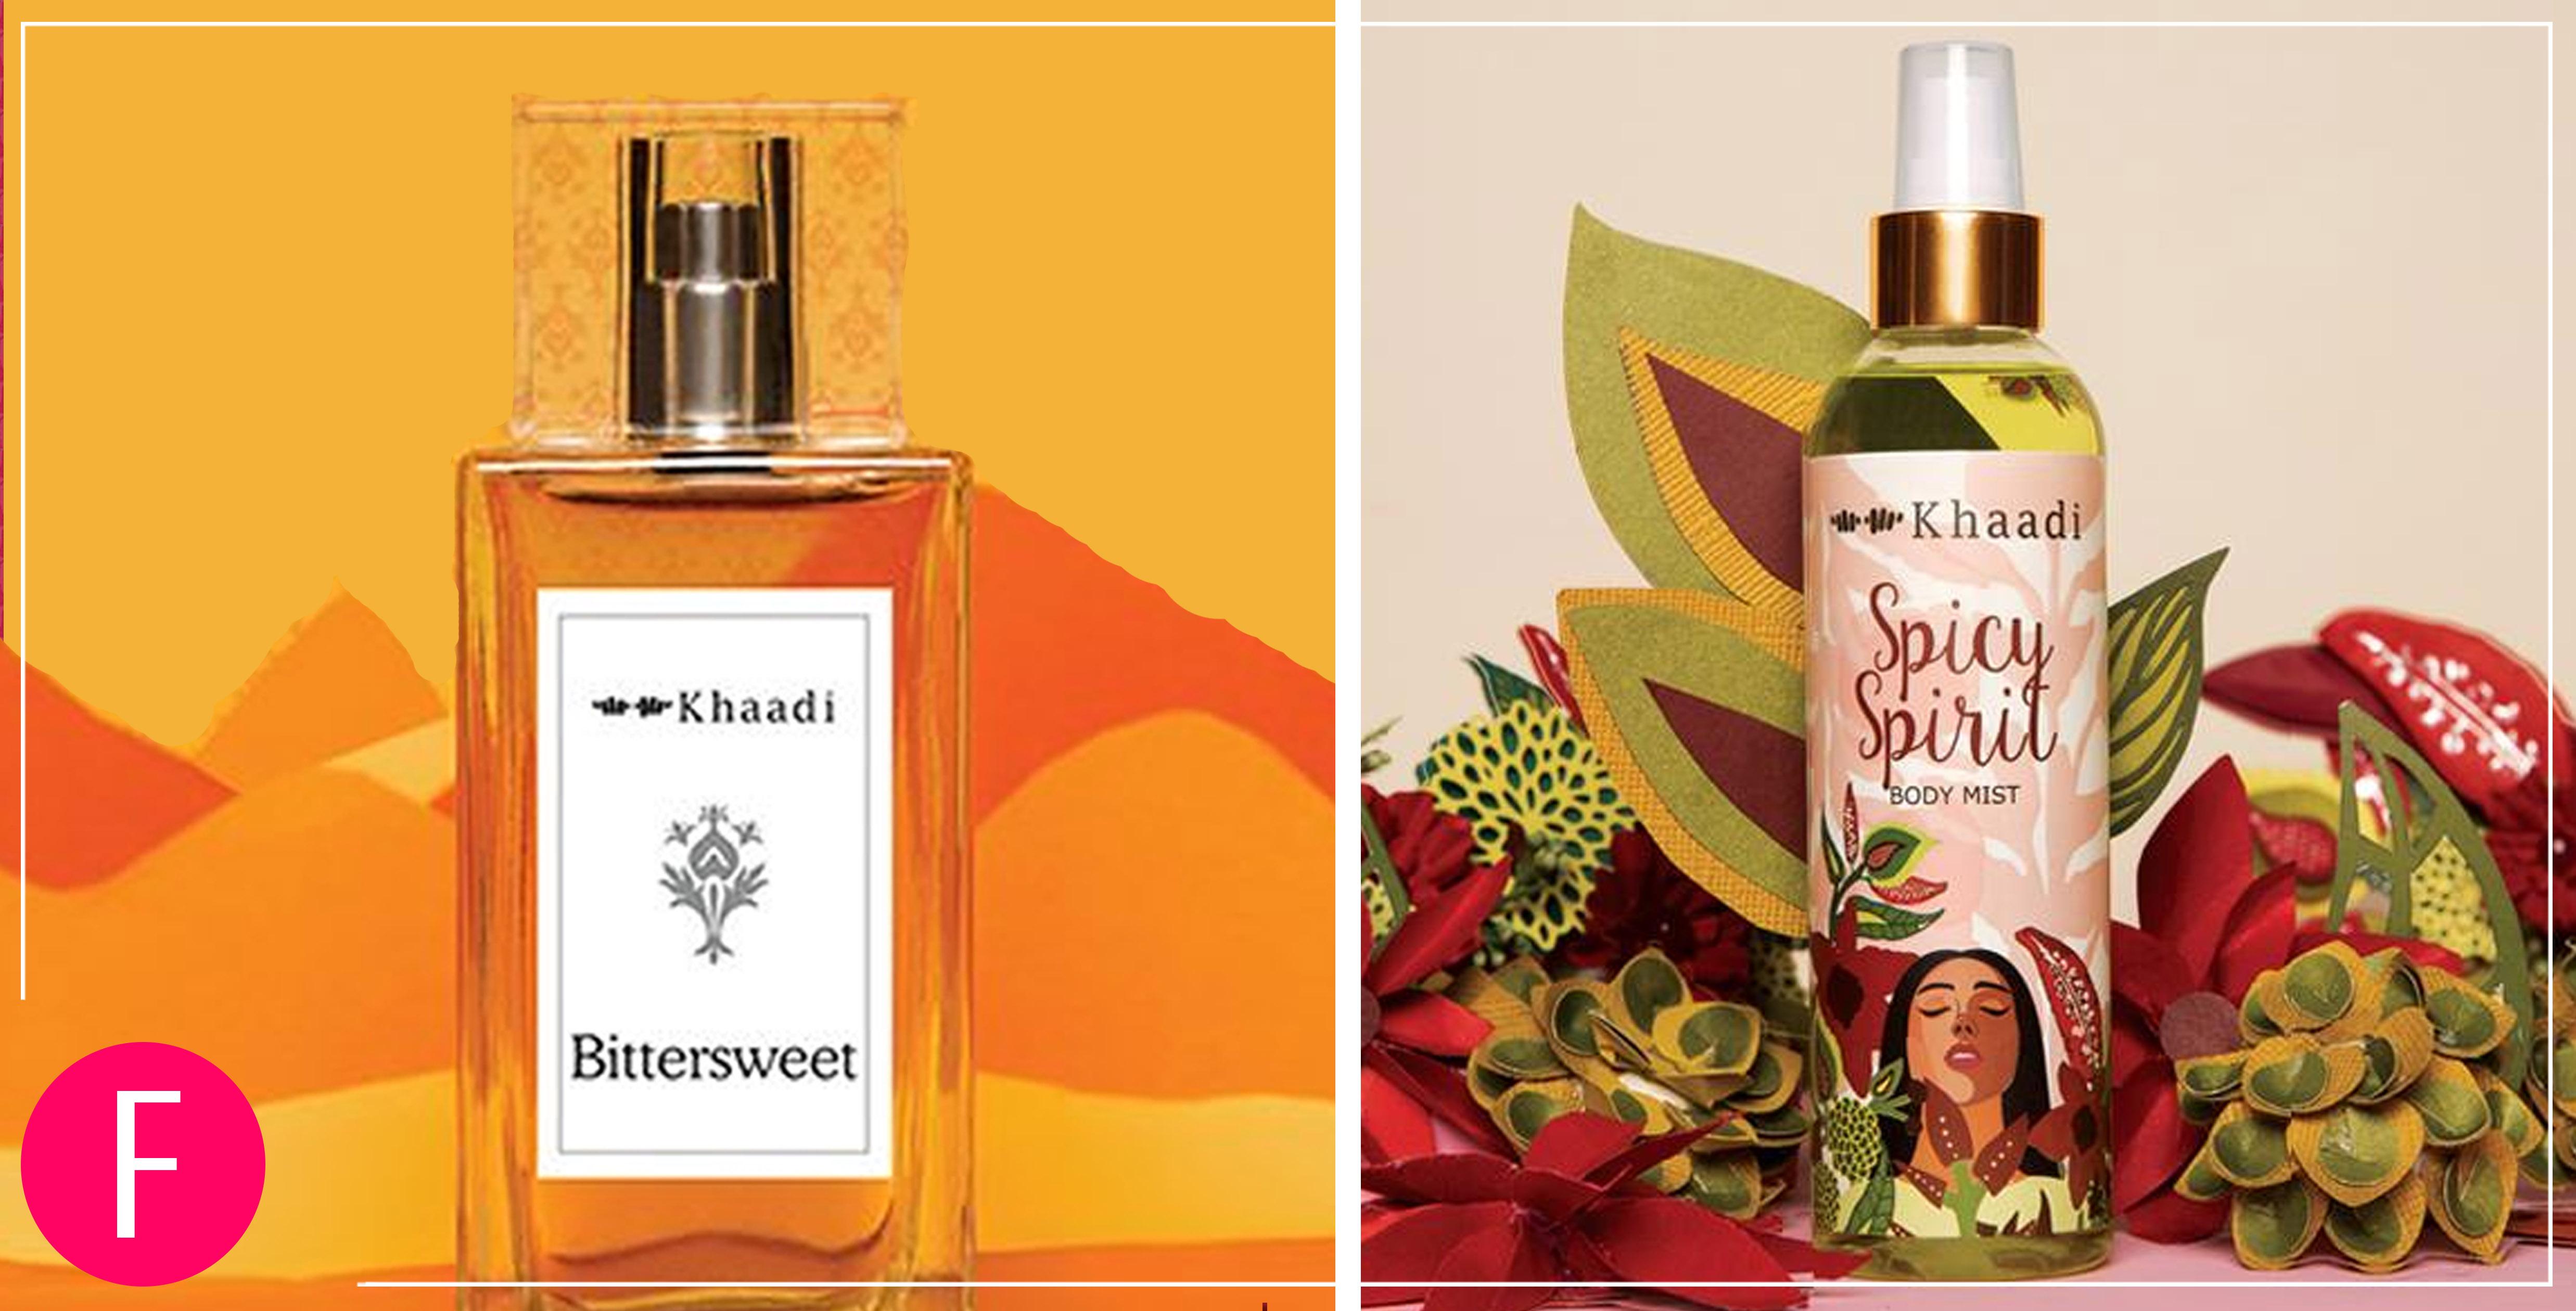 Khaadi, fragrances, perfumes. Khaadi perfumes